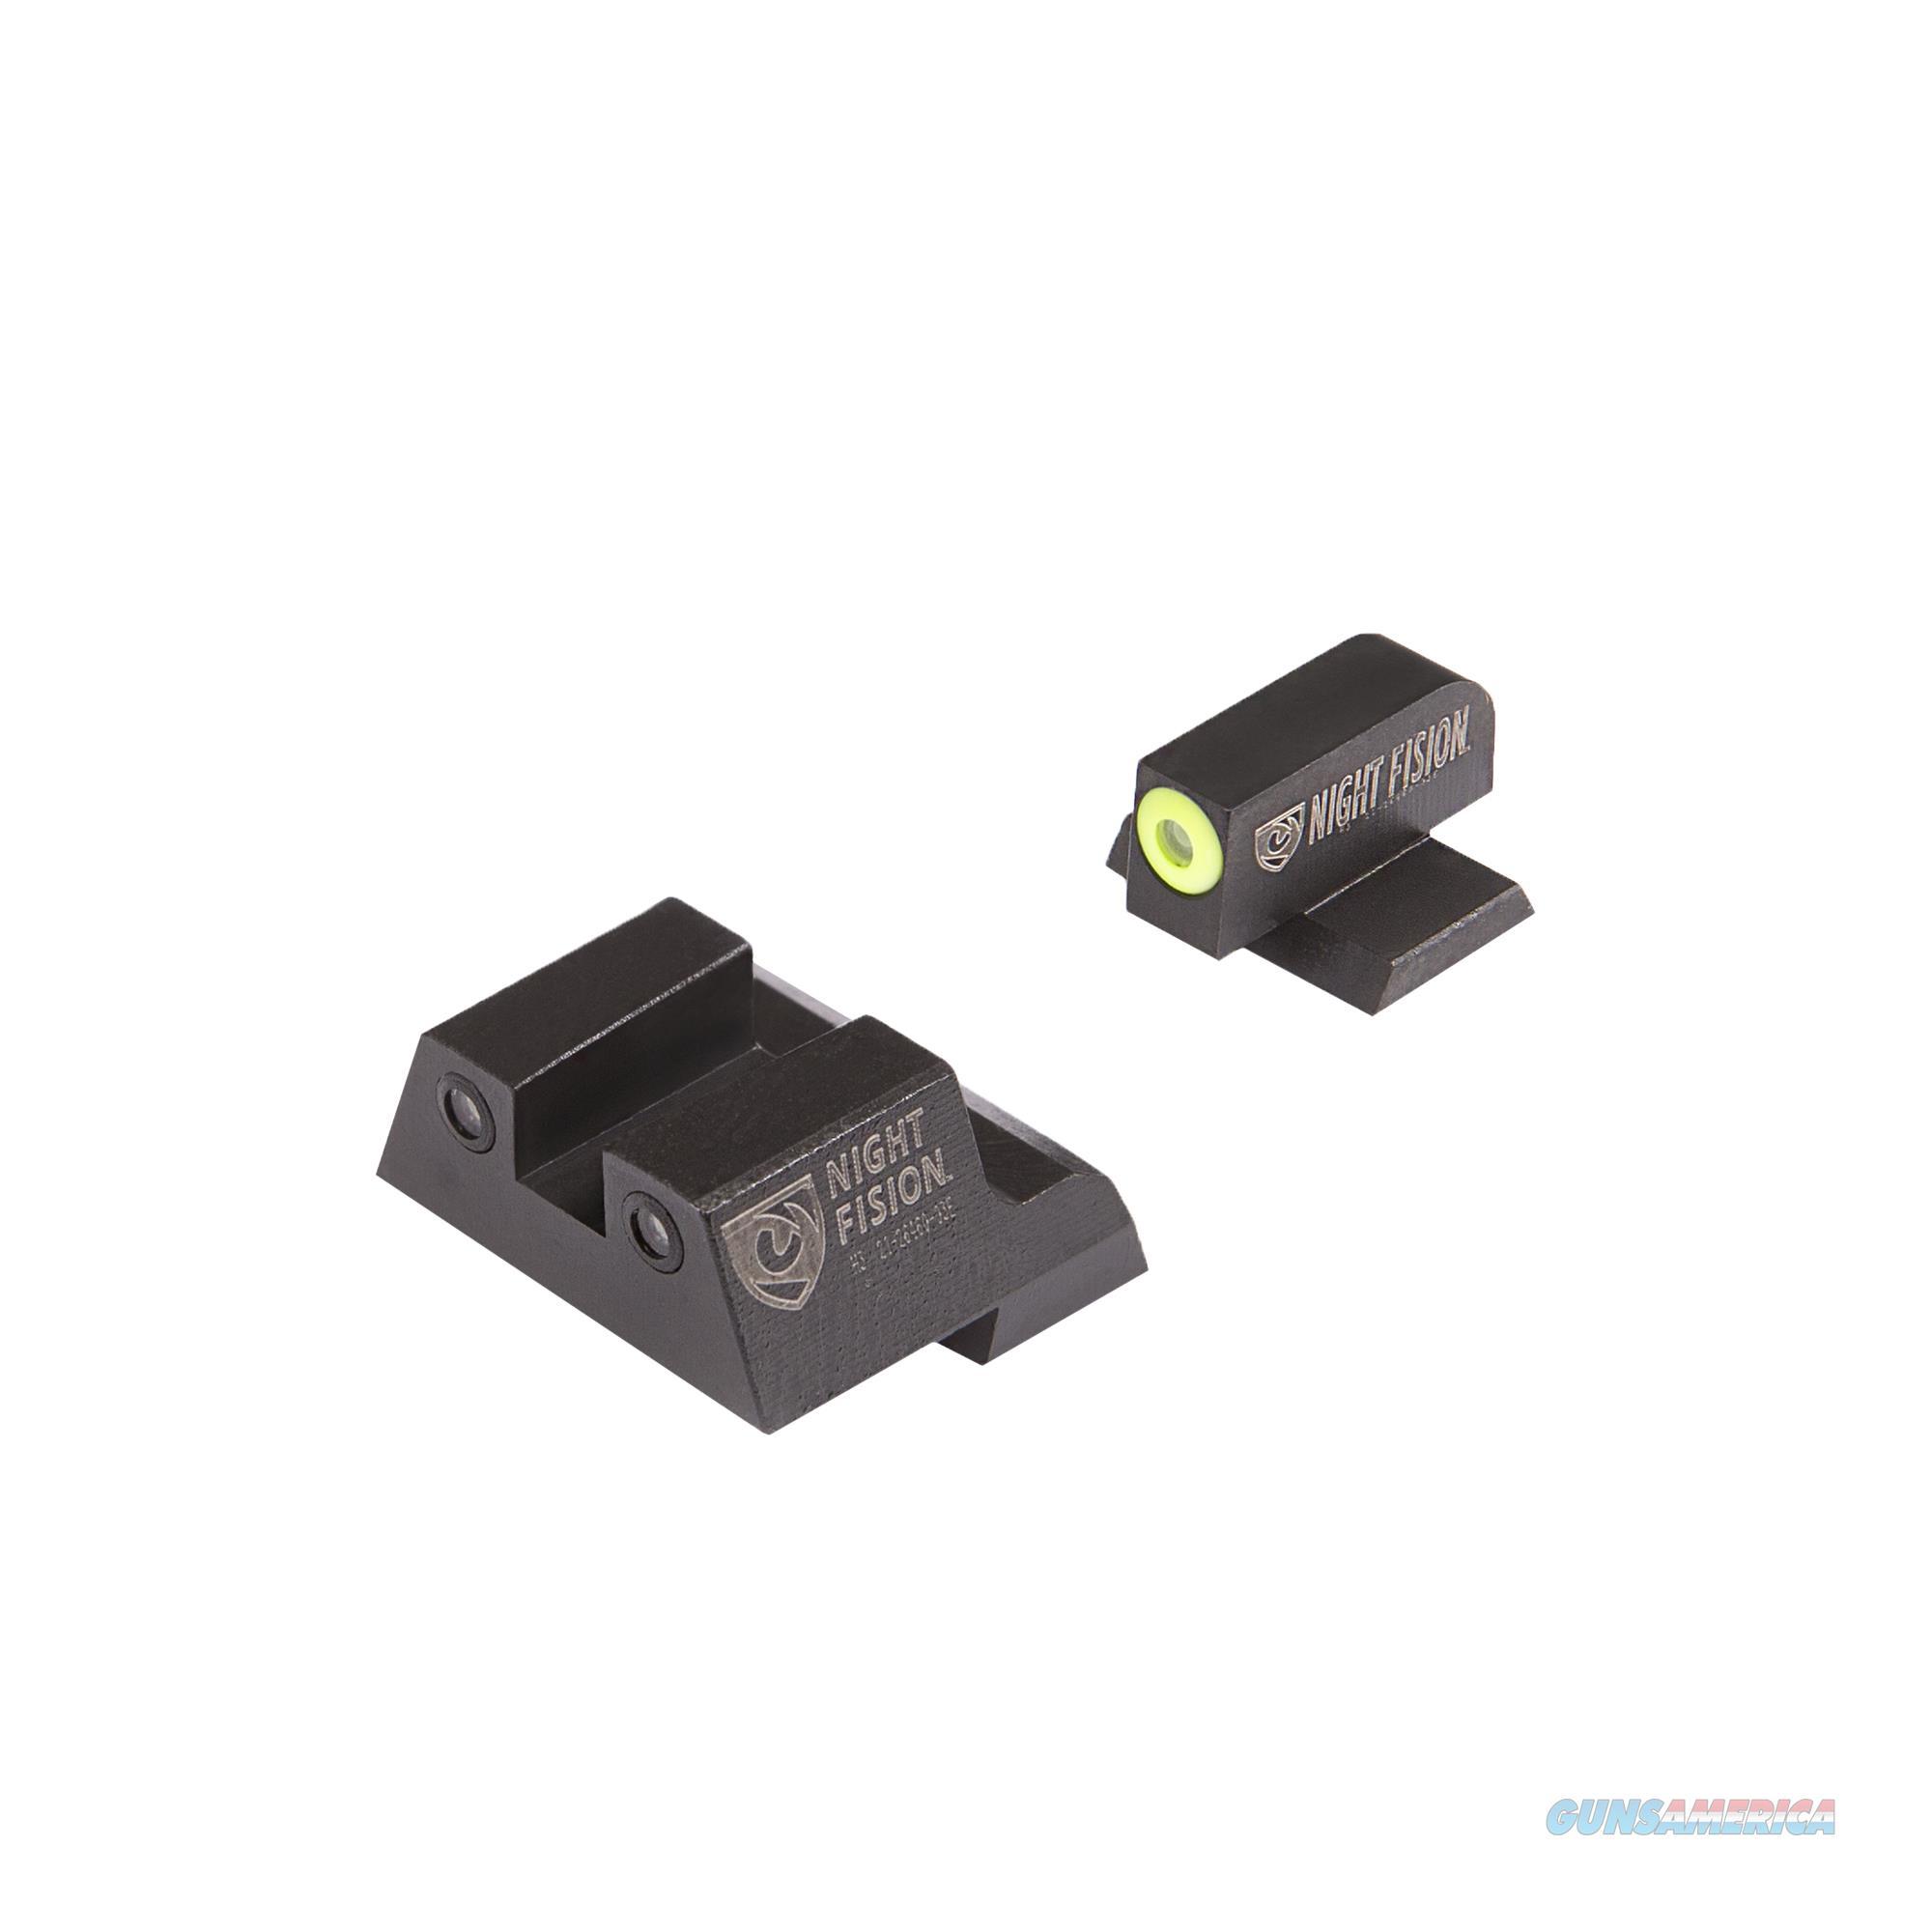 Night Fision Perfect Dot Night Sight Set, Canik Tp9sf Elite, Tp9sf, And Tp9sa CNK027003YGZ  Non-Guns > Gun Parts > Misc > Rifles